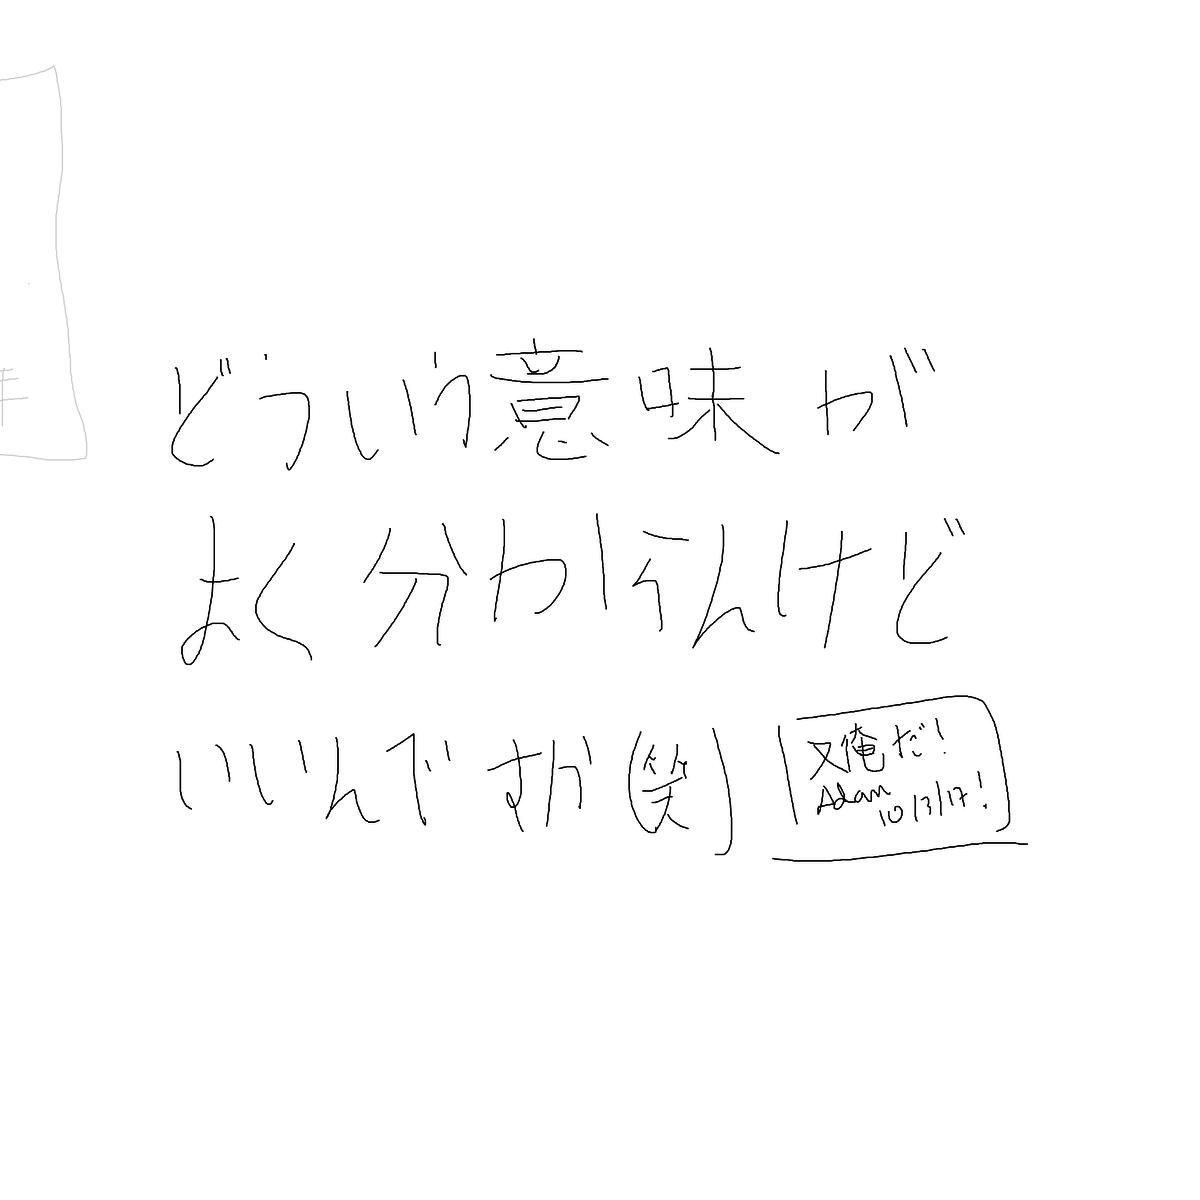 BAAAM drawing#22900 lat:52.4786911010742200lng: 13.4079790115356450